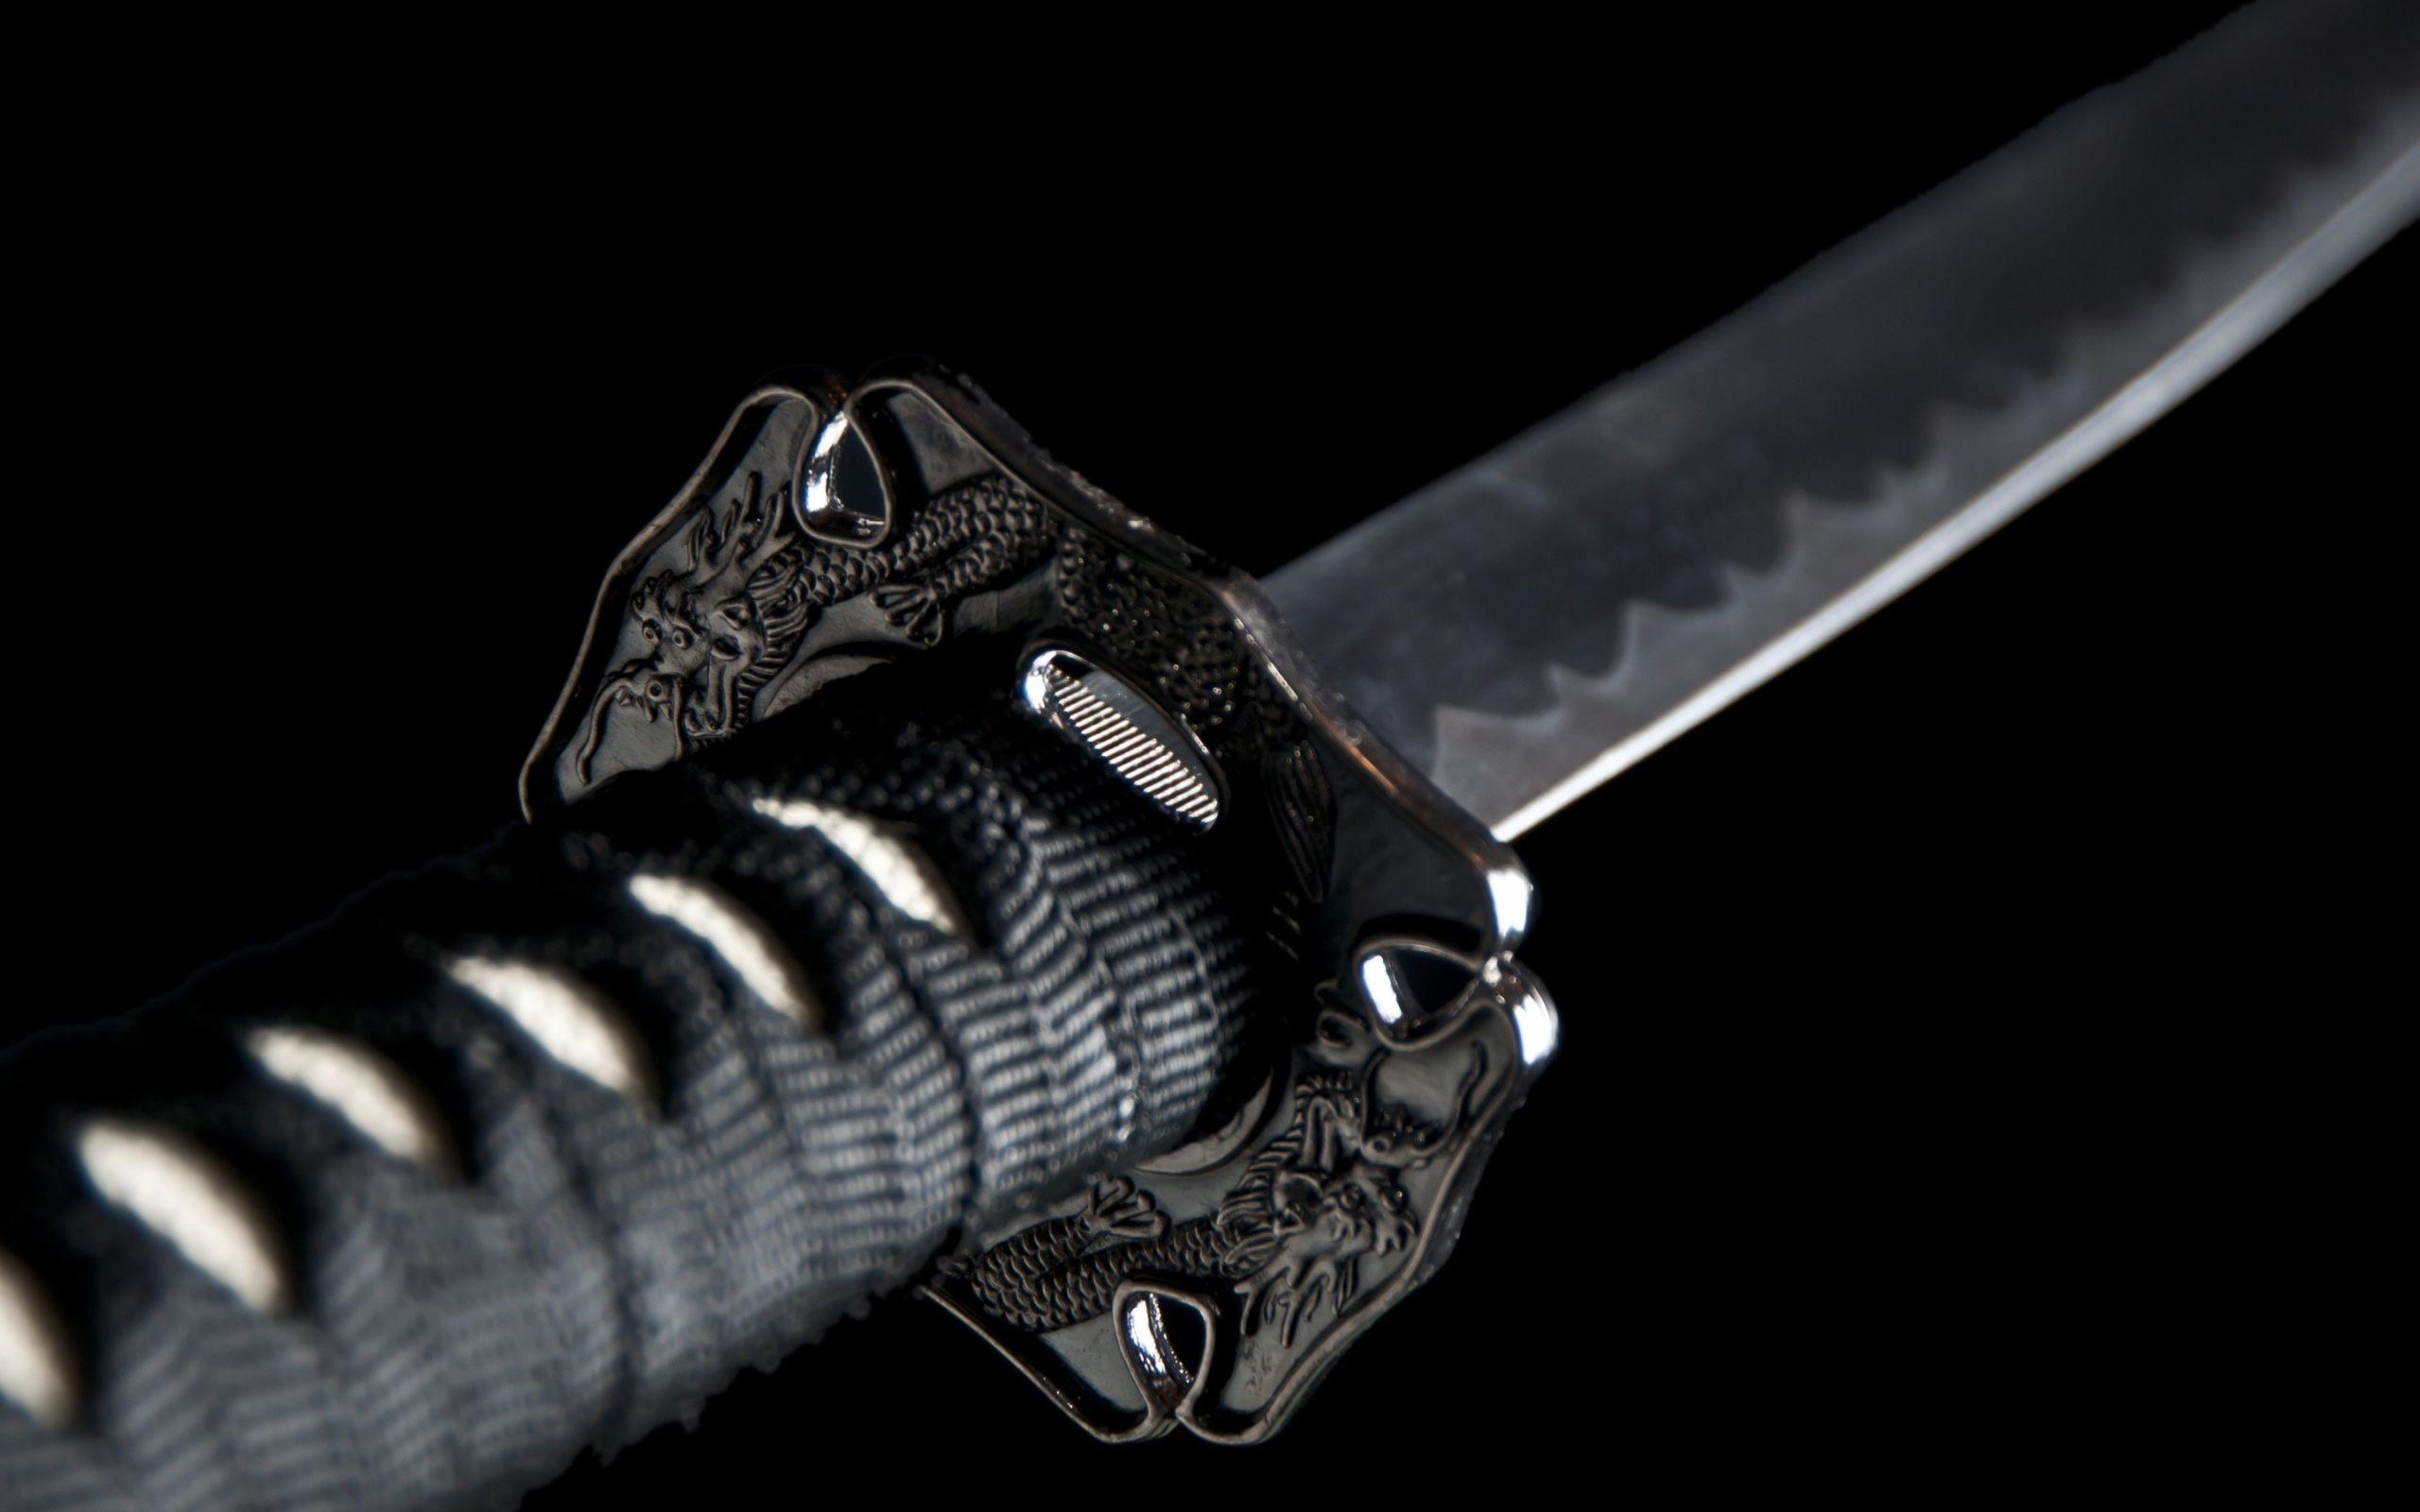 Sword HD Wallpaper Background 19446 2560x1600